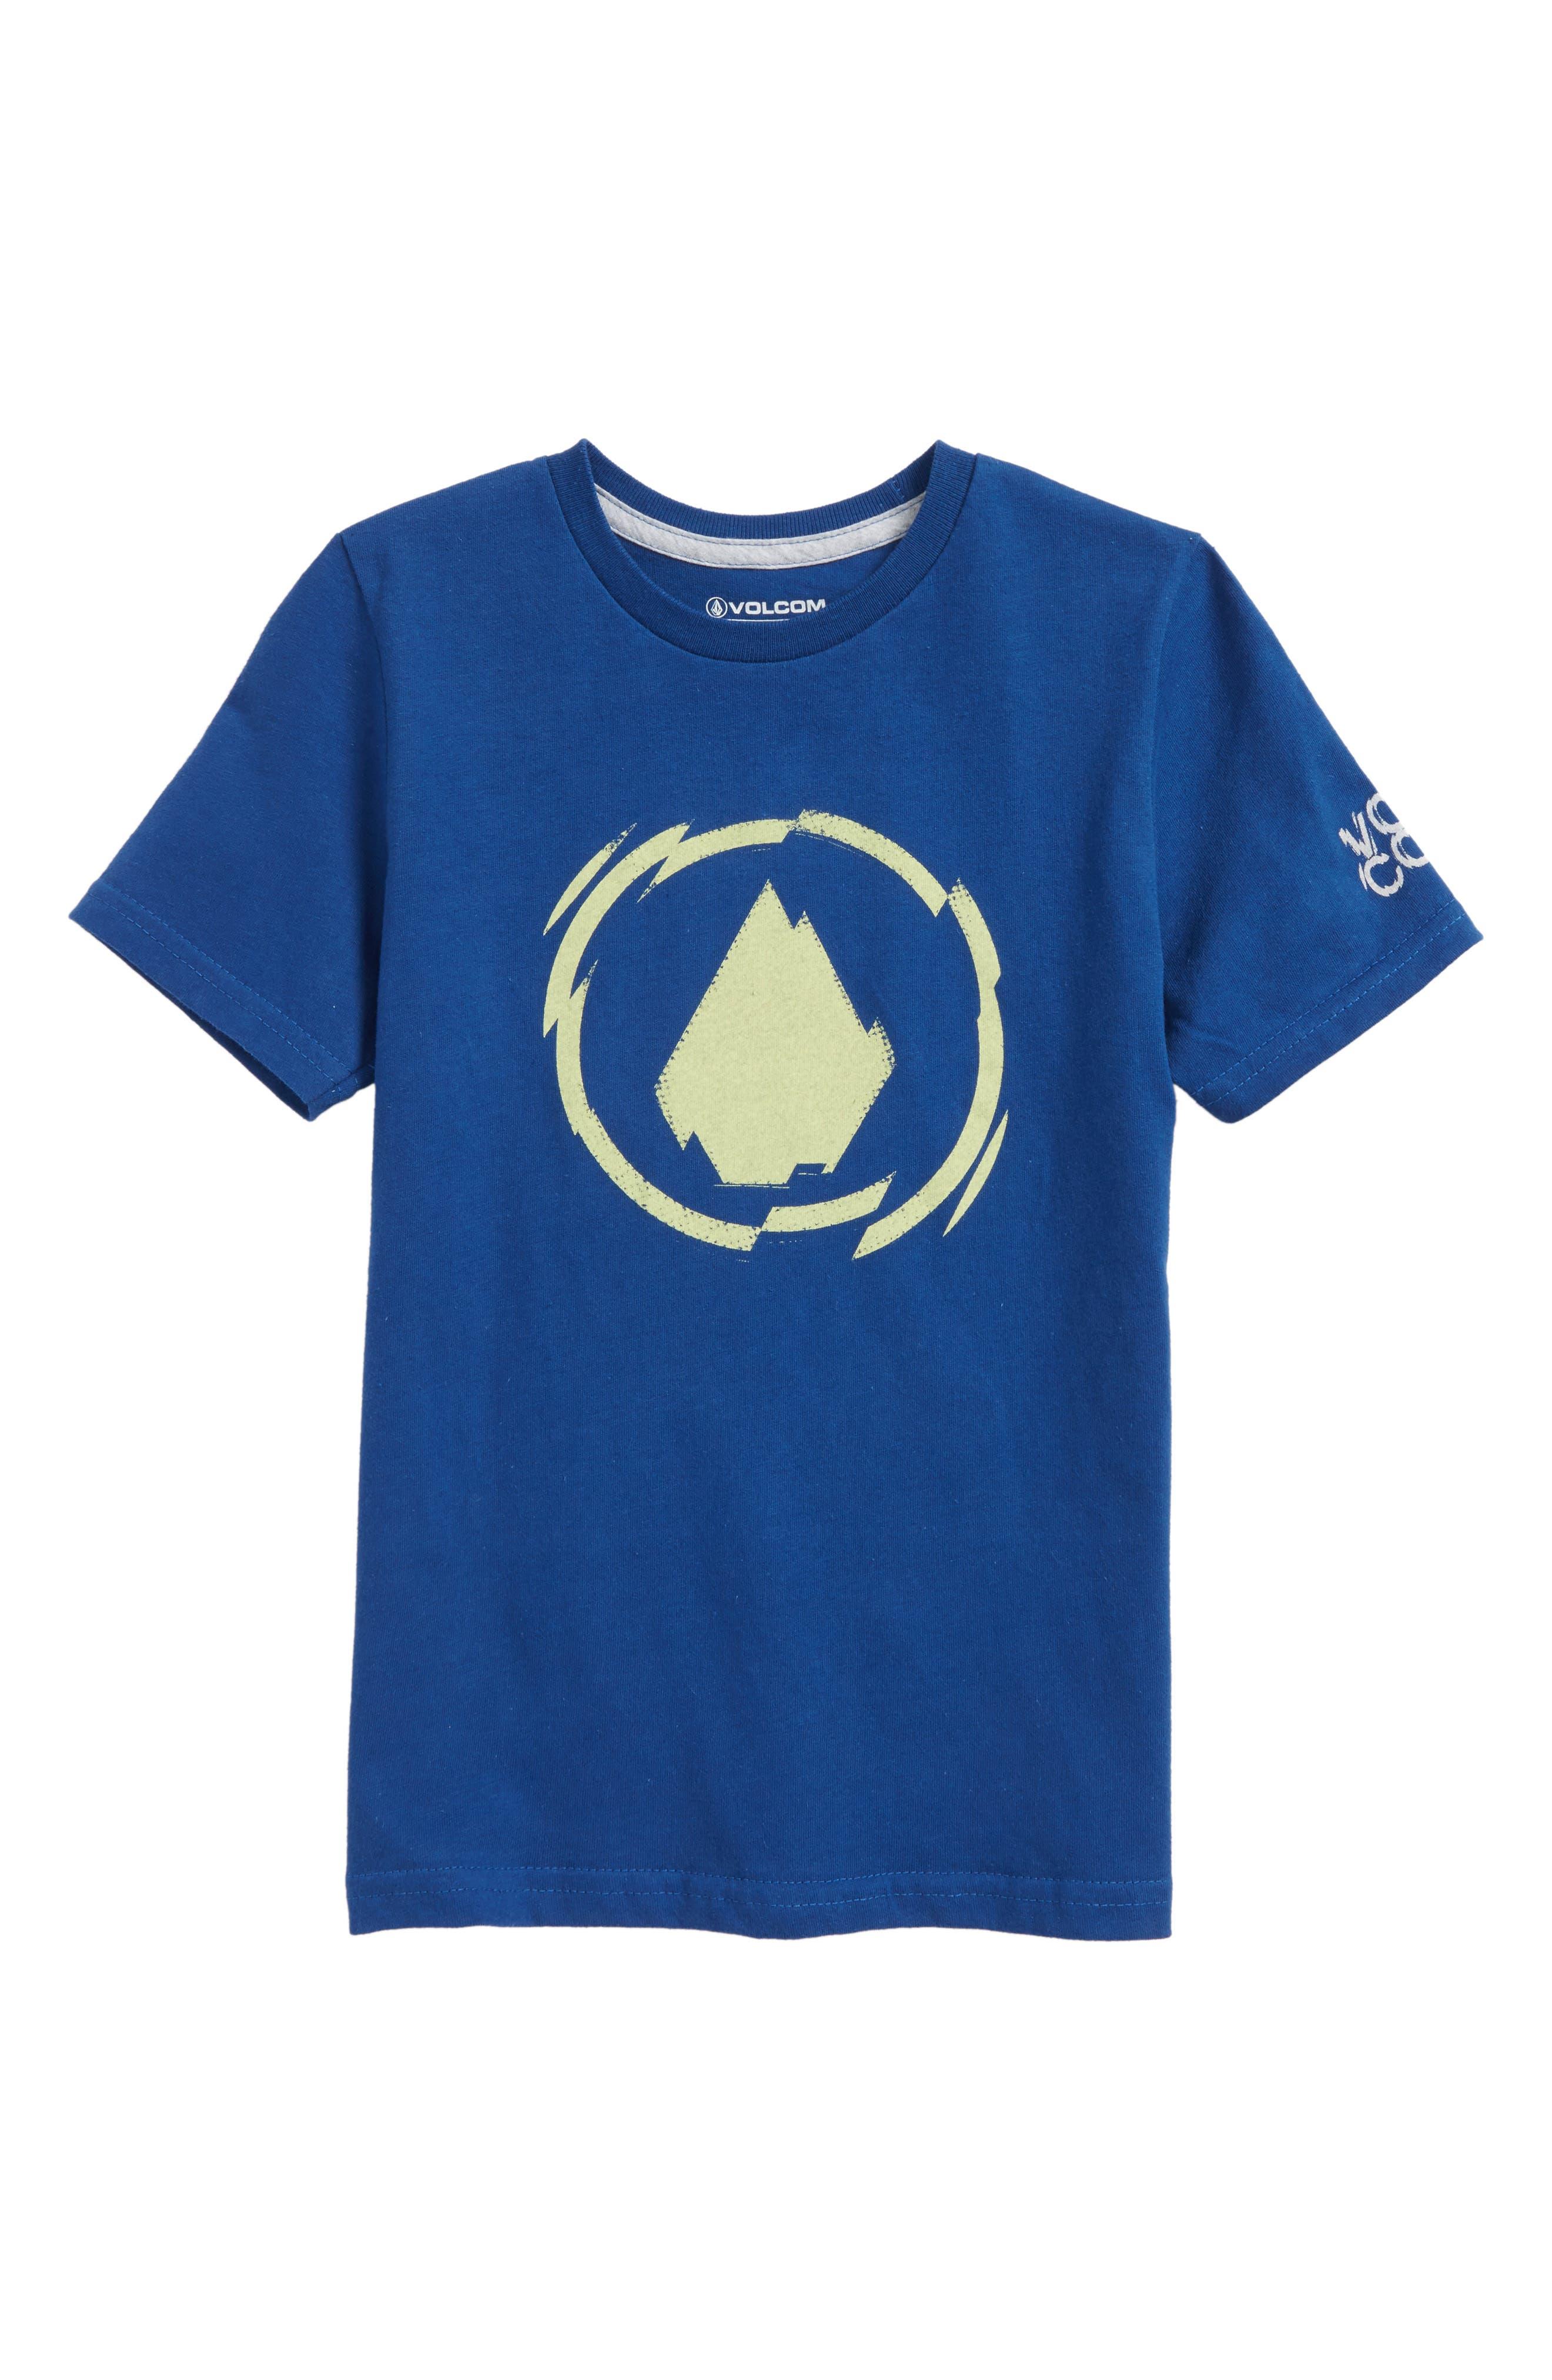 Alternate Image 1 Selected - Volcom Shatter T-Shirt (Big Boys)